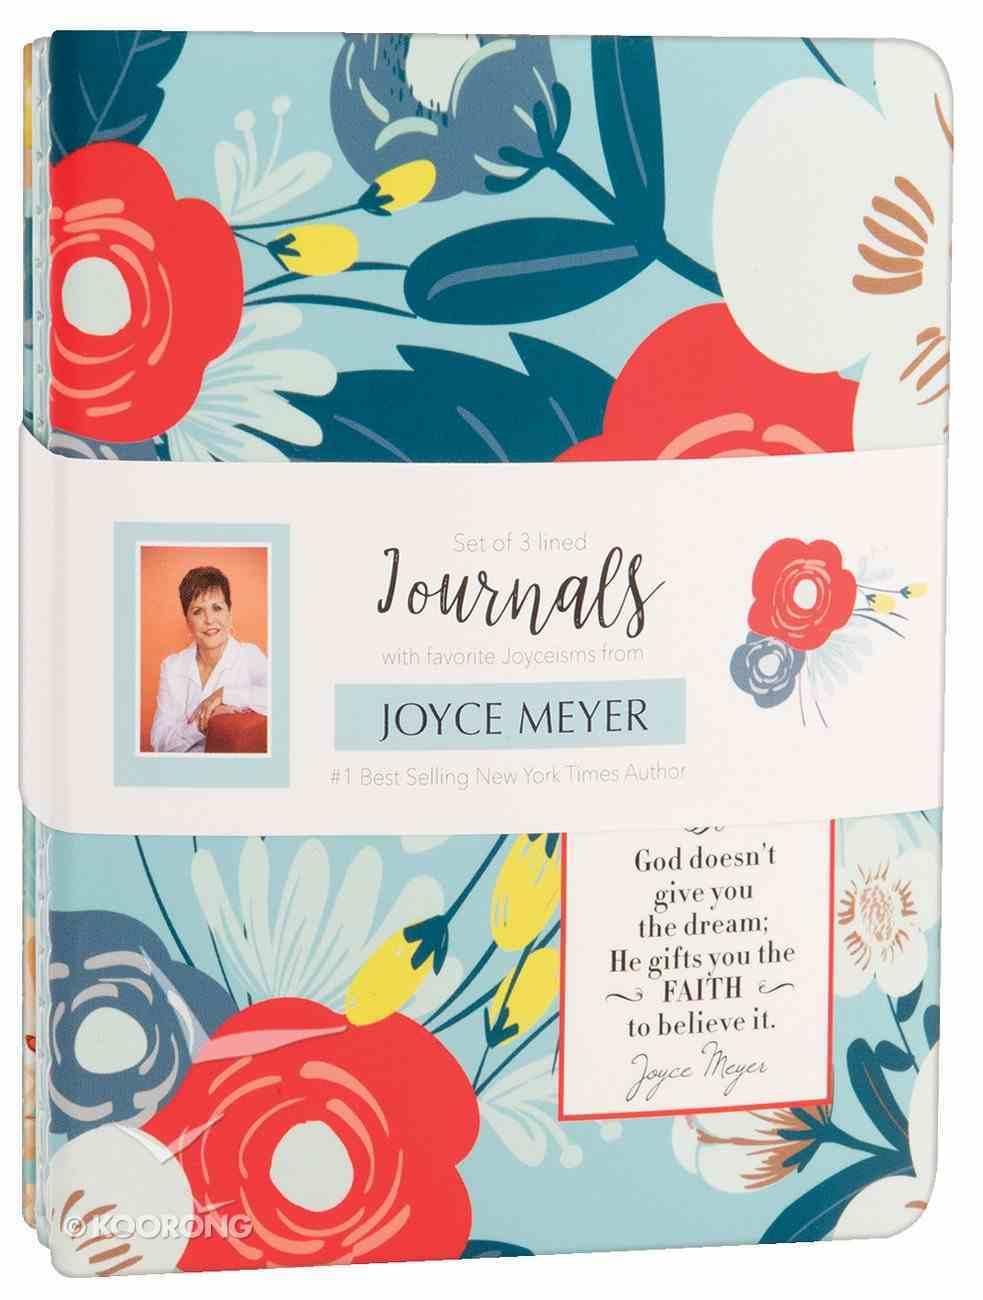 Joyce Meyer Journal 3 Pack: God's Gift to Me, Orange/Red/White/Blue Stationery